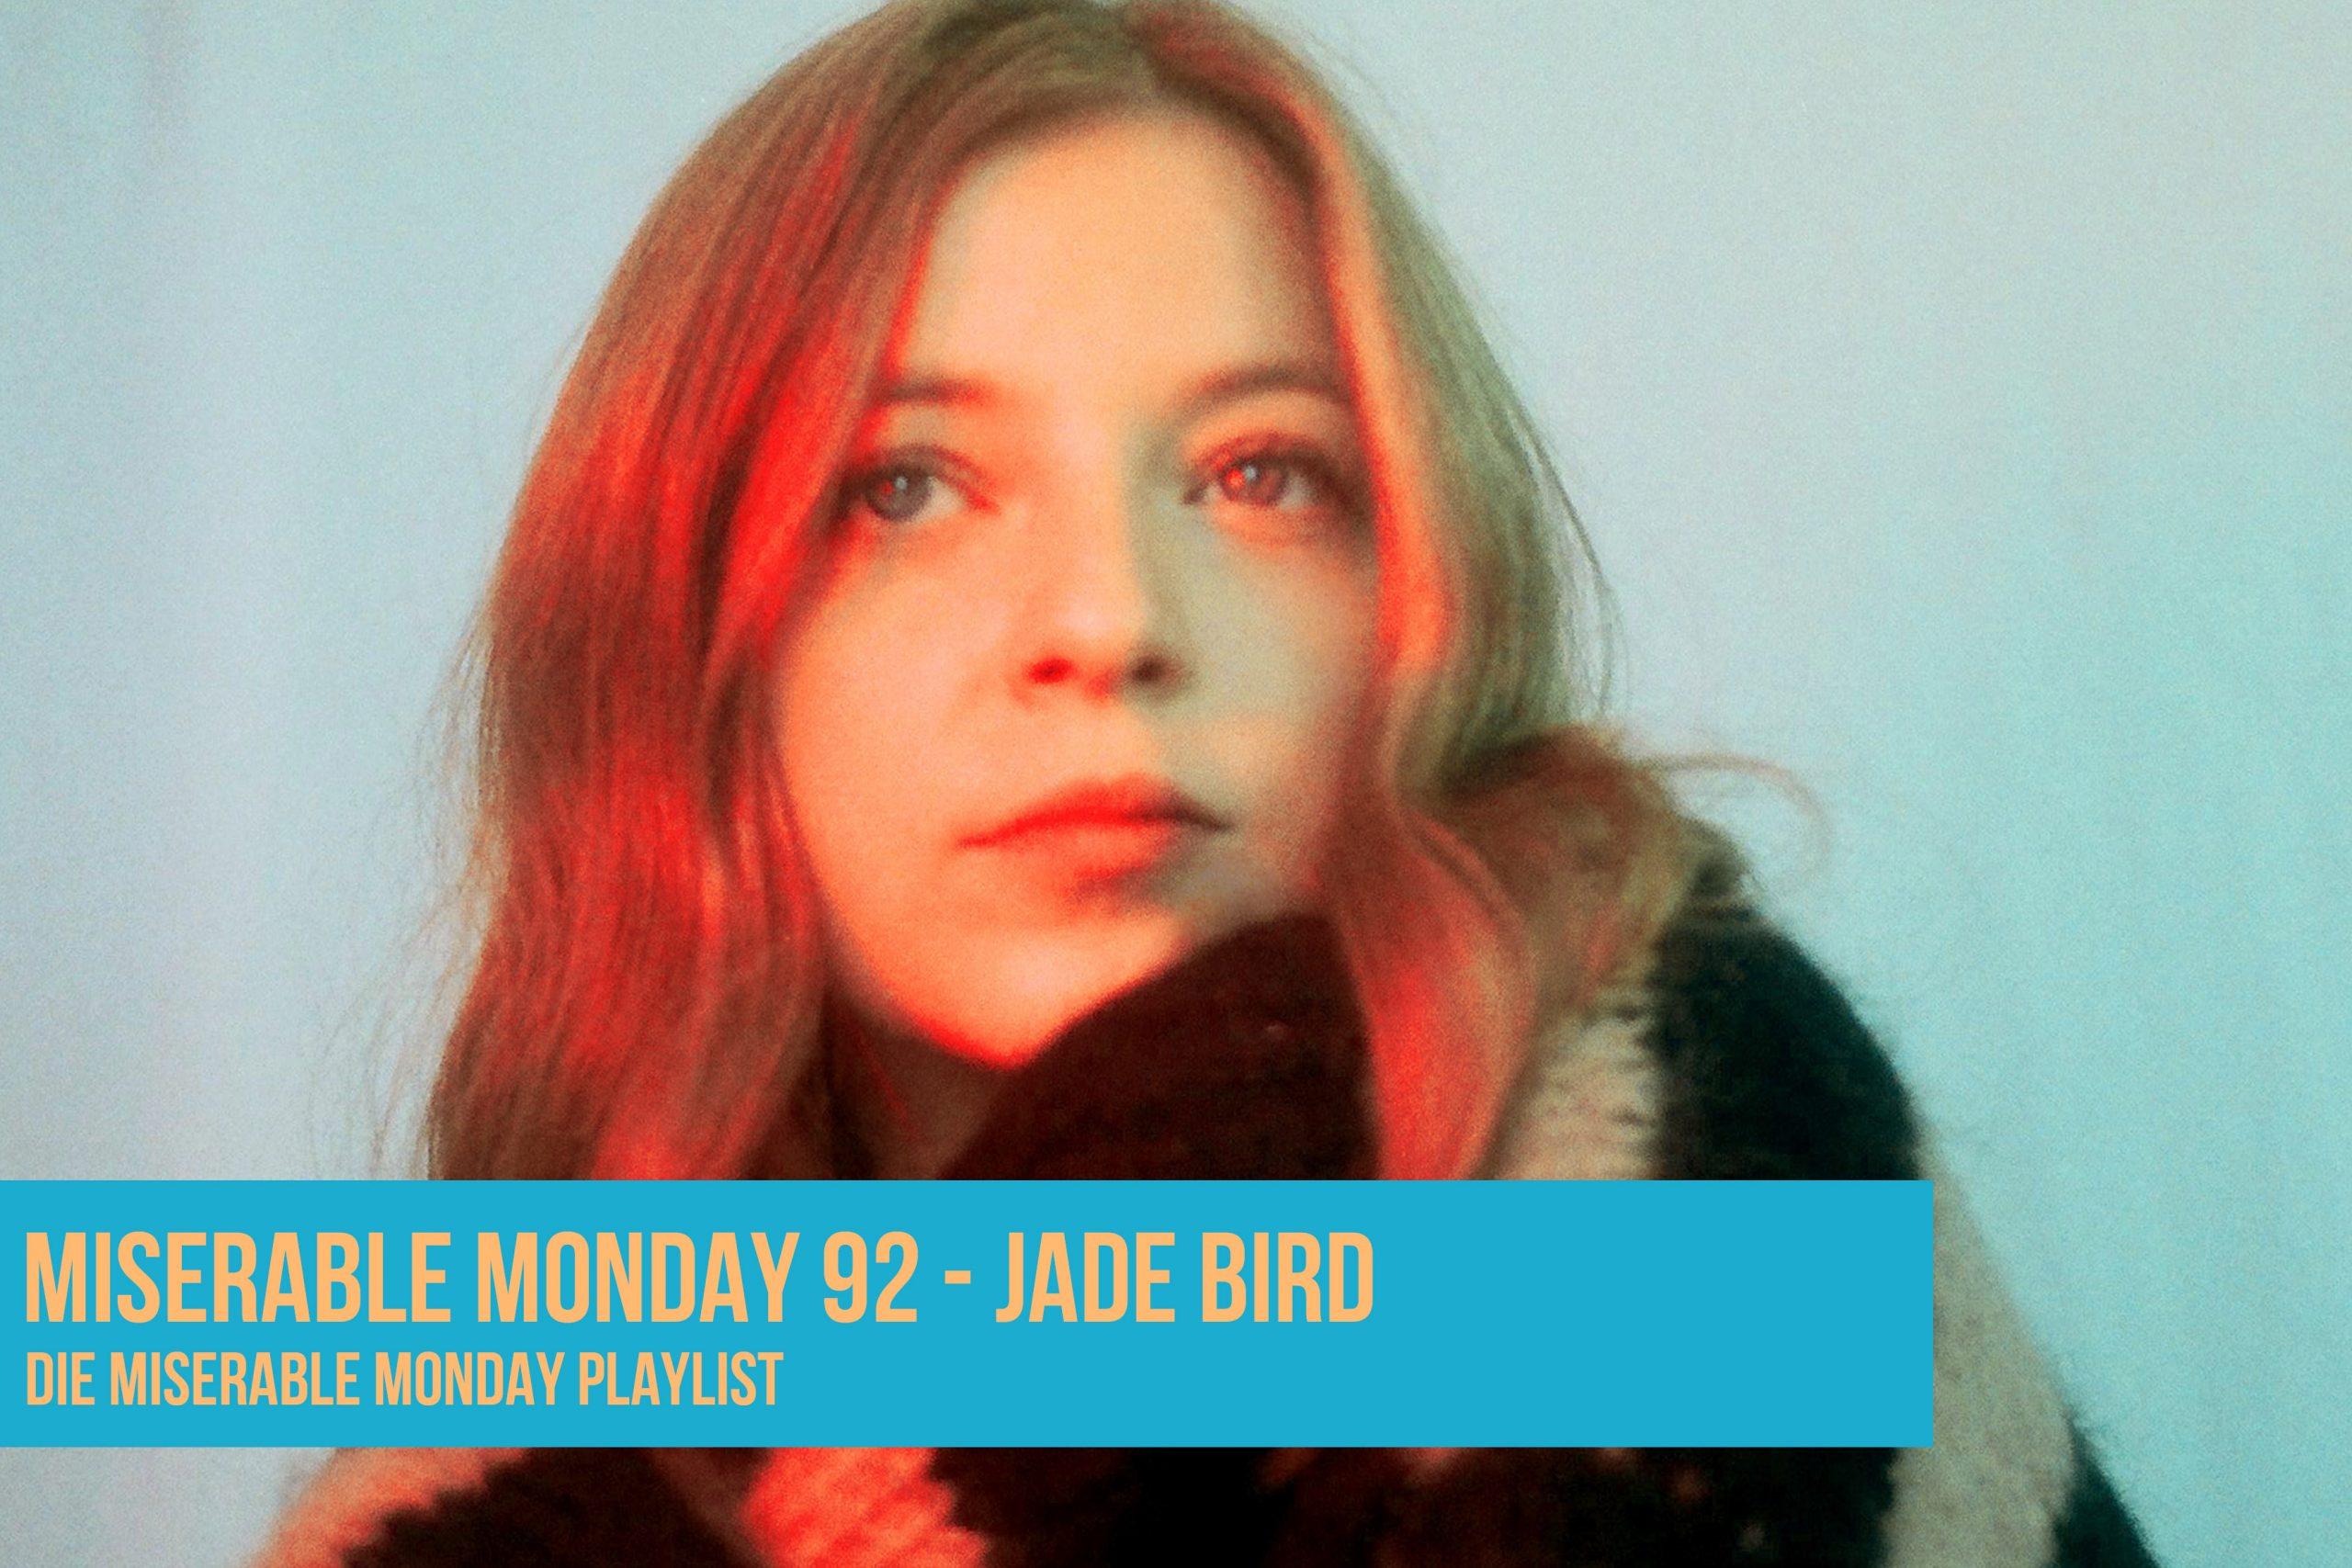 92 - Jade Bird